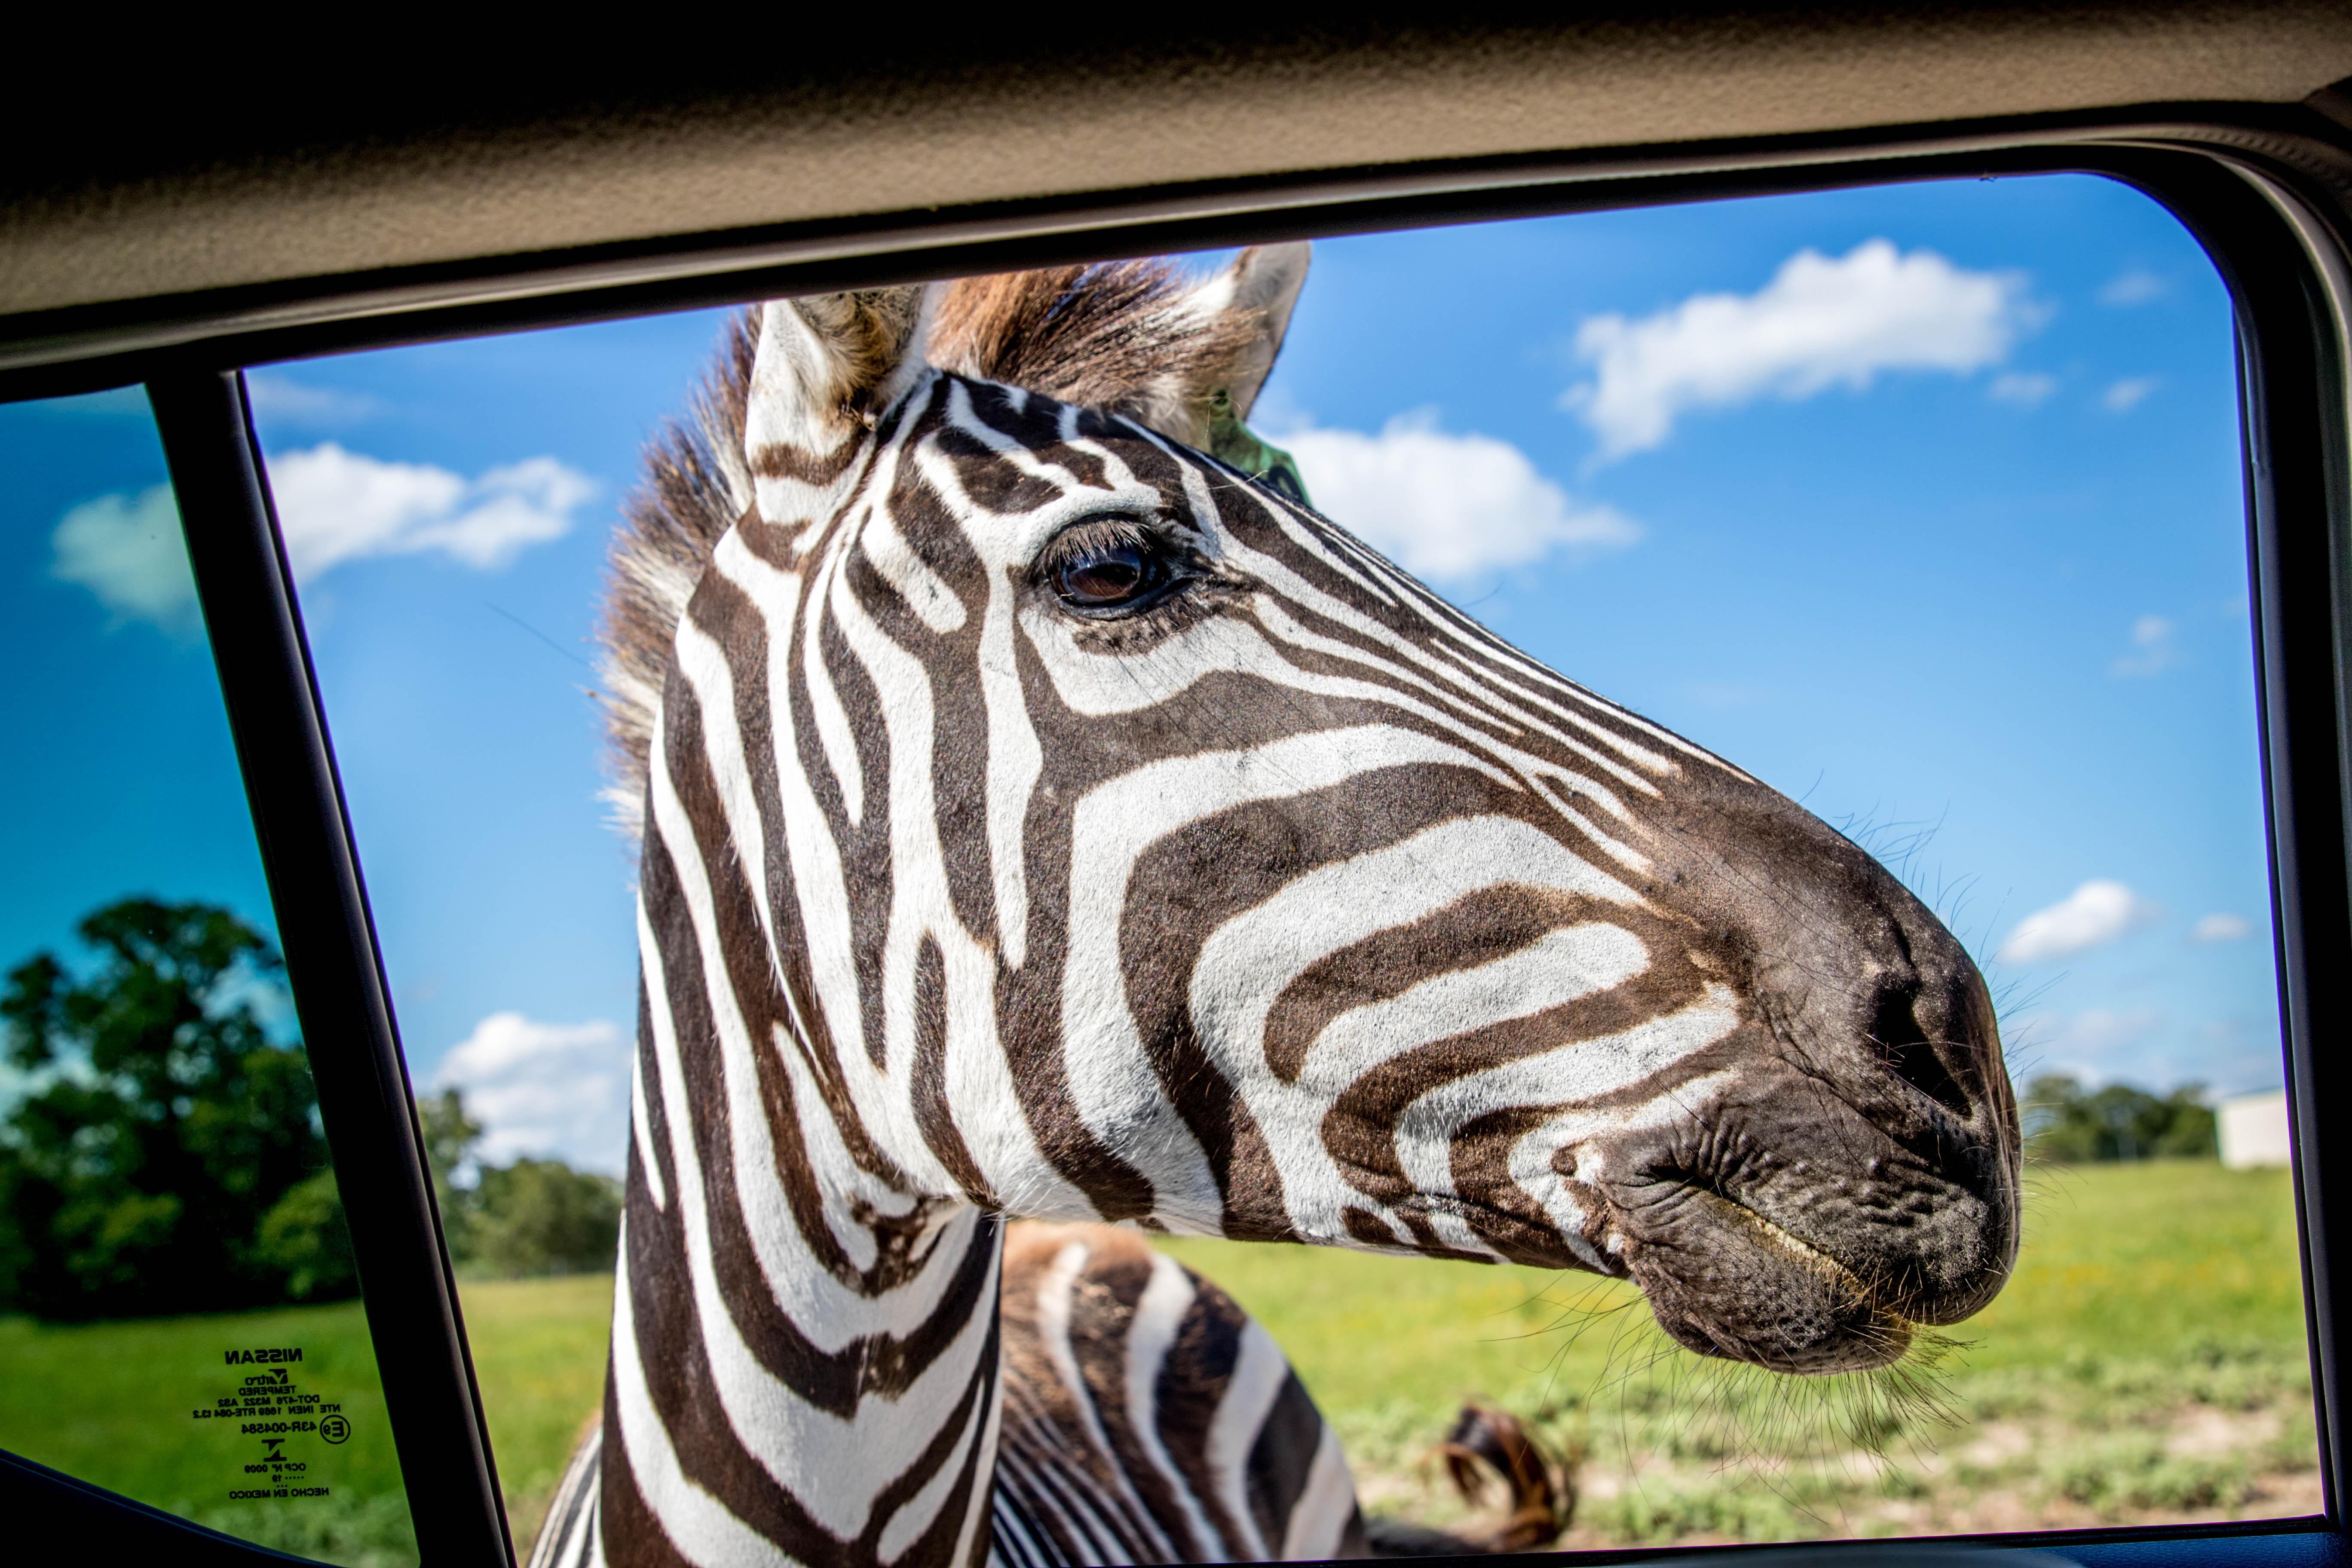 Zebra at Aggieland Safari